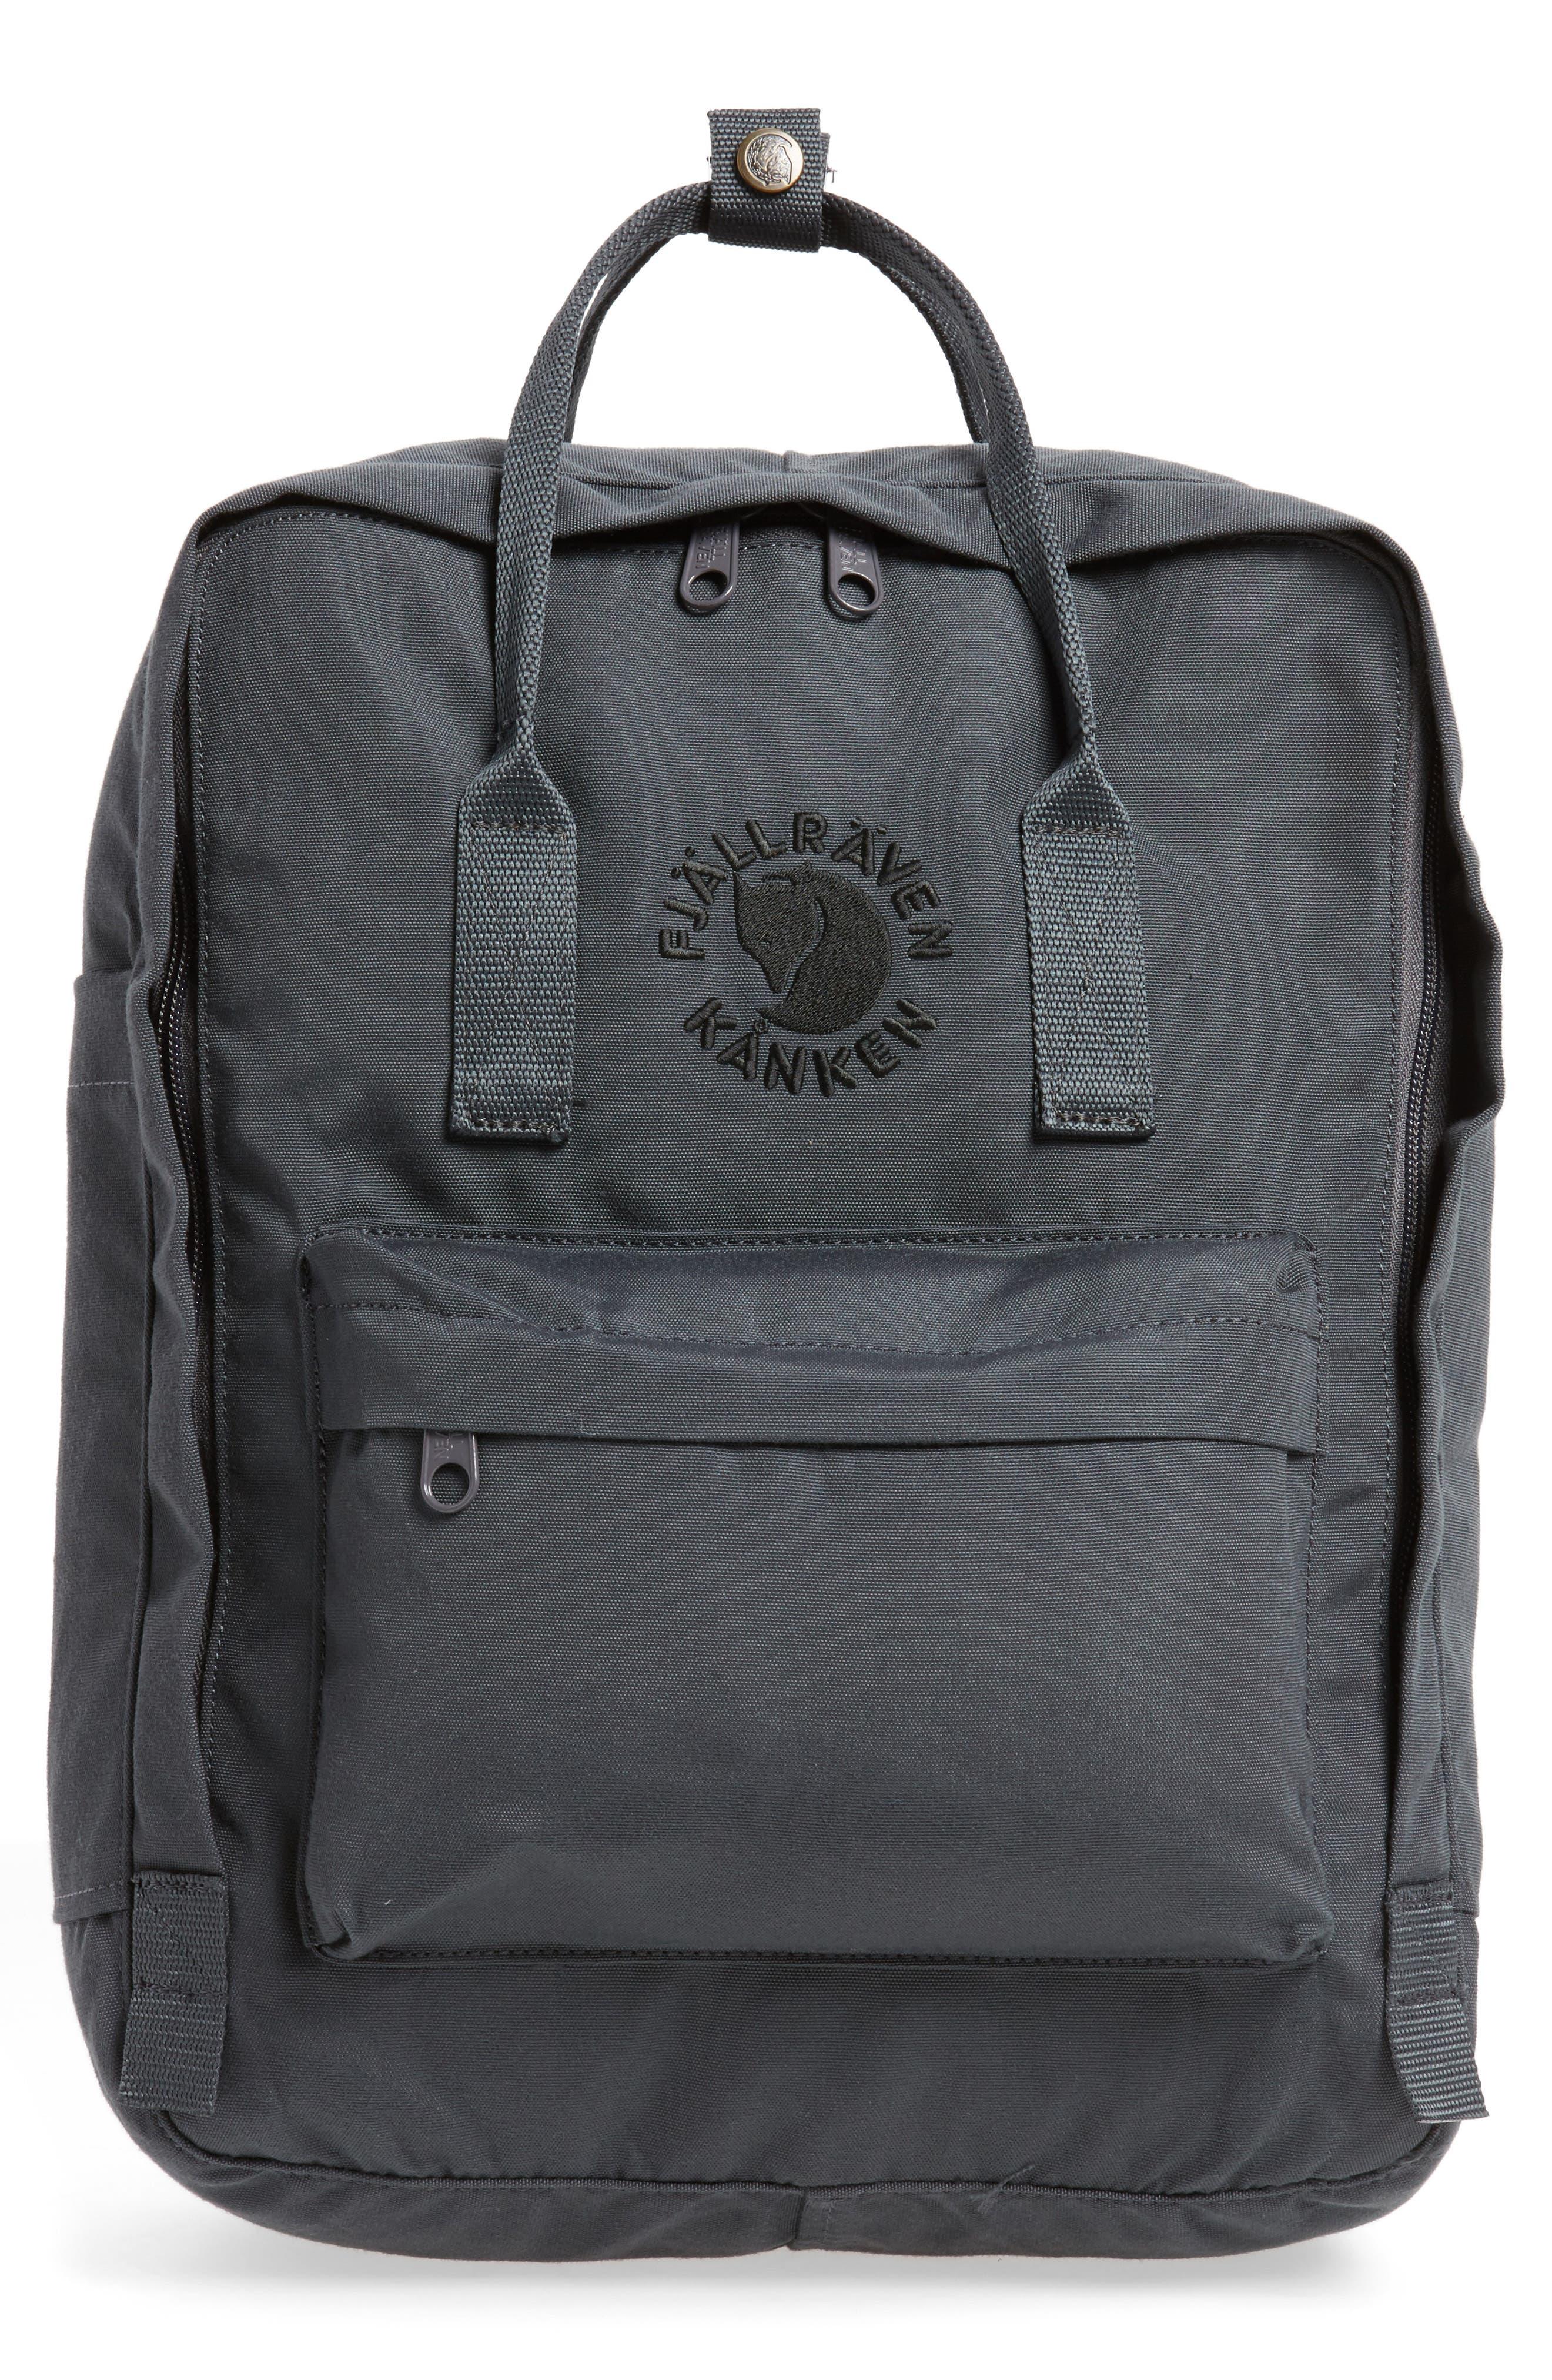 Main Image - Fjällräven Re-Kånken Water Resistant Backpack